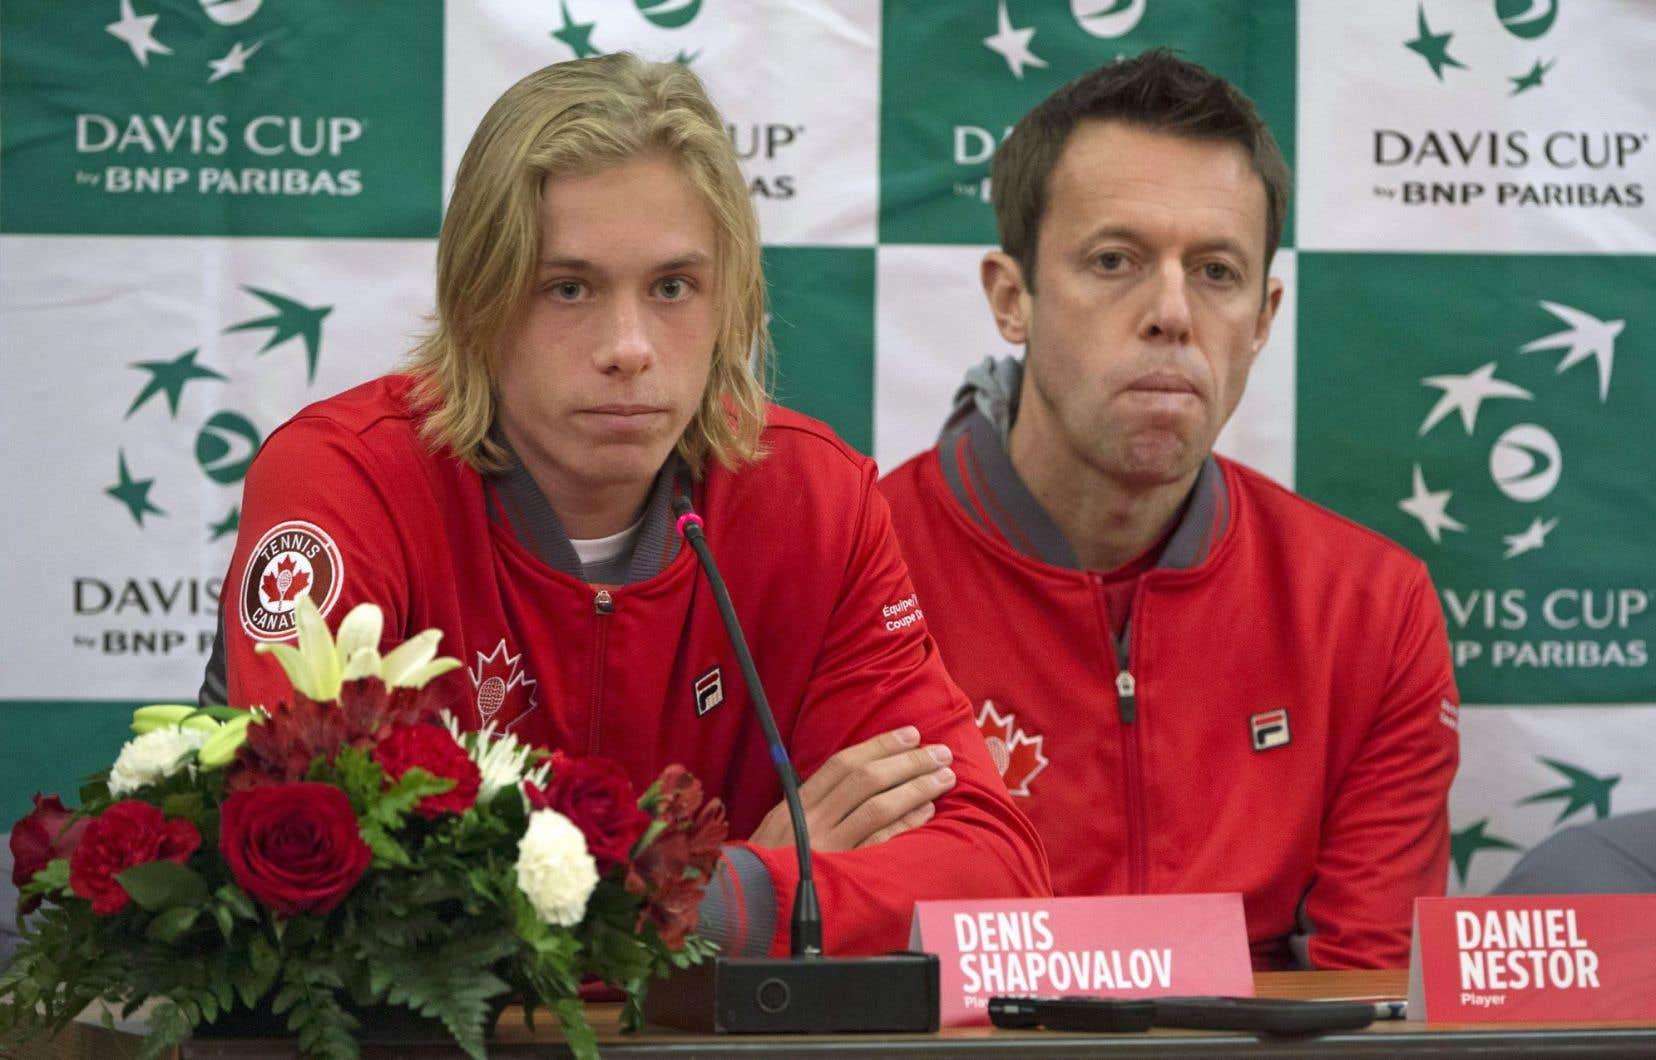 Denis Shapovalov et Daniel Nestor en conférence de presse